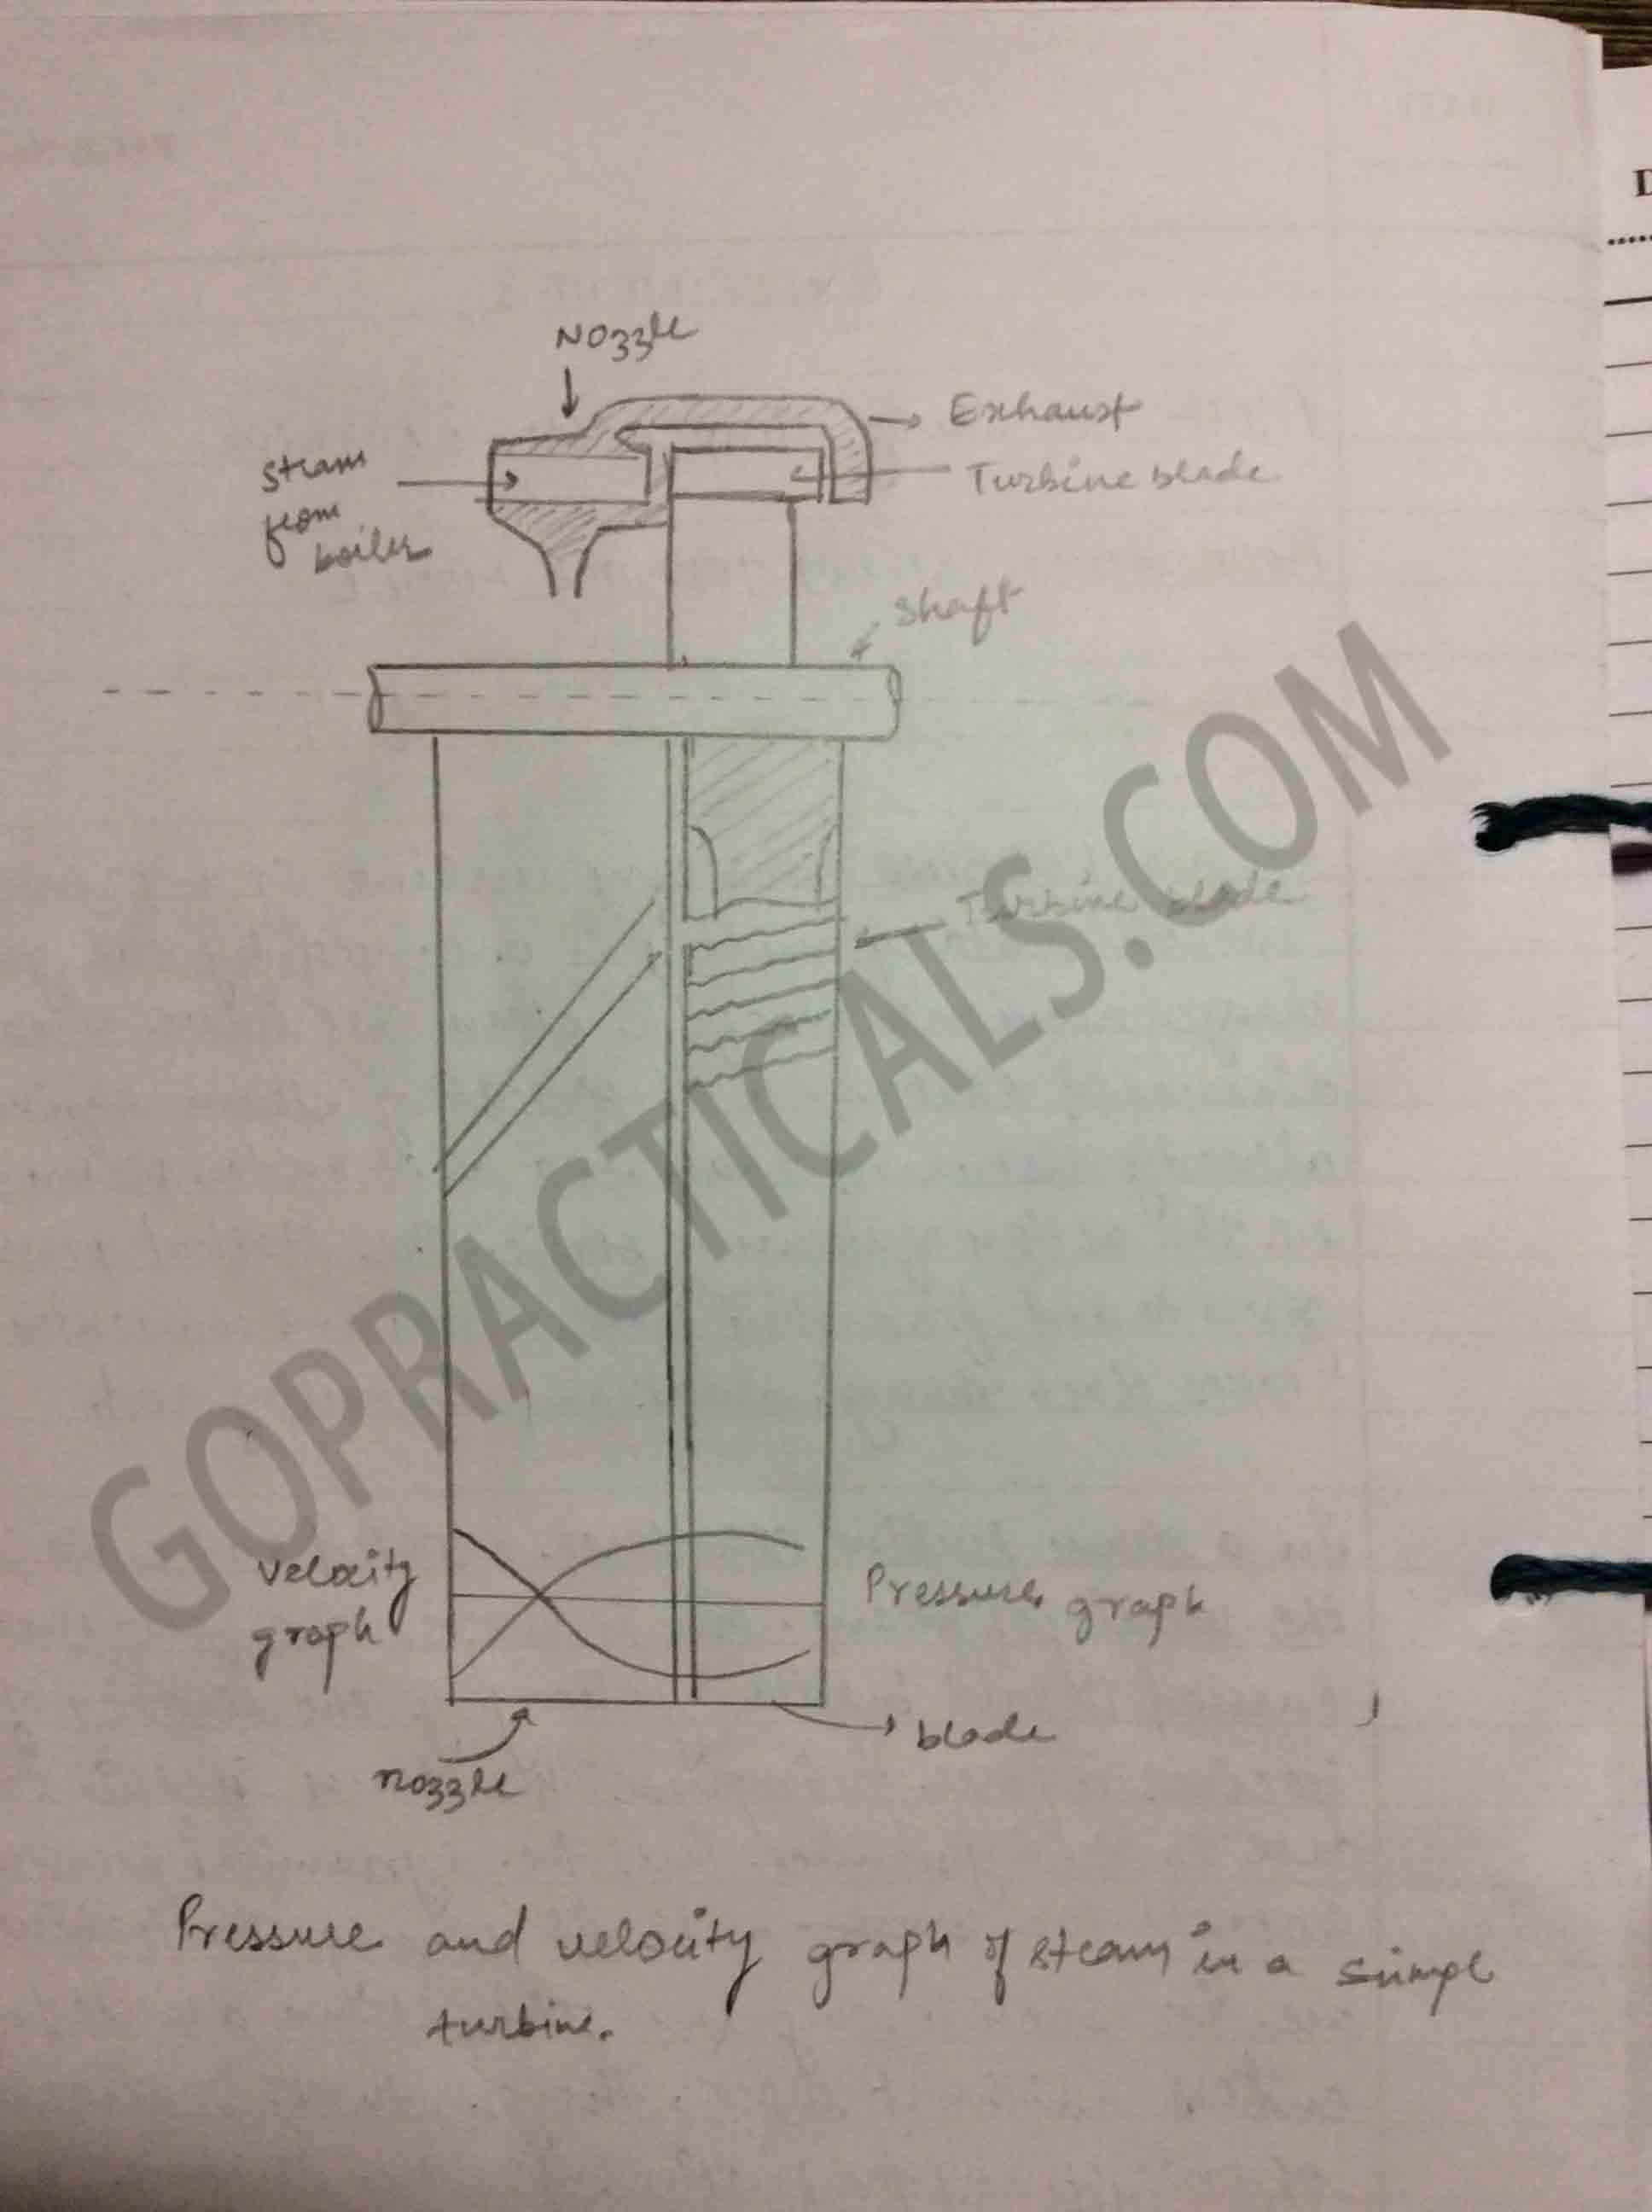 Study of basic steam turbine mechanical practical-3